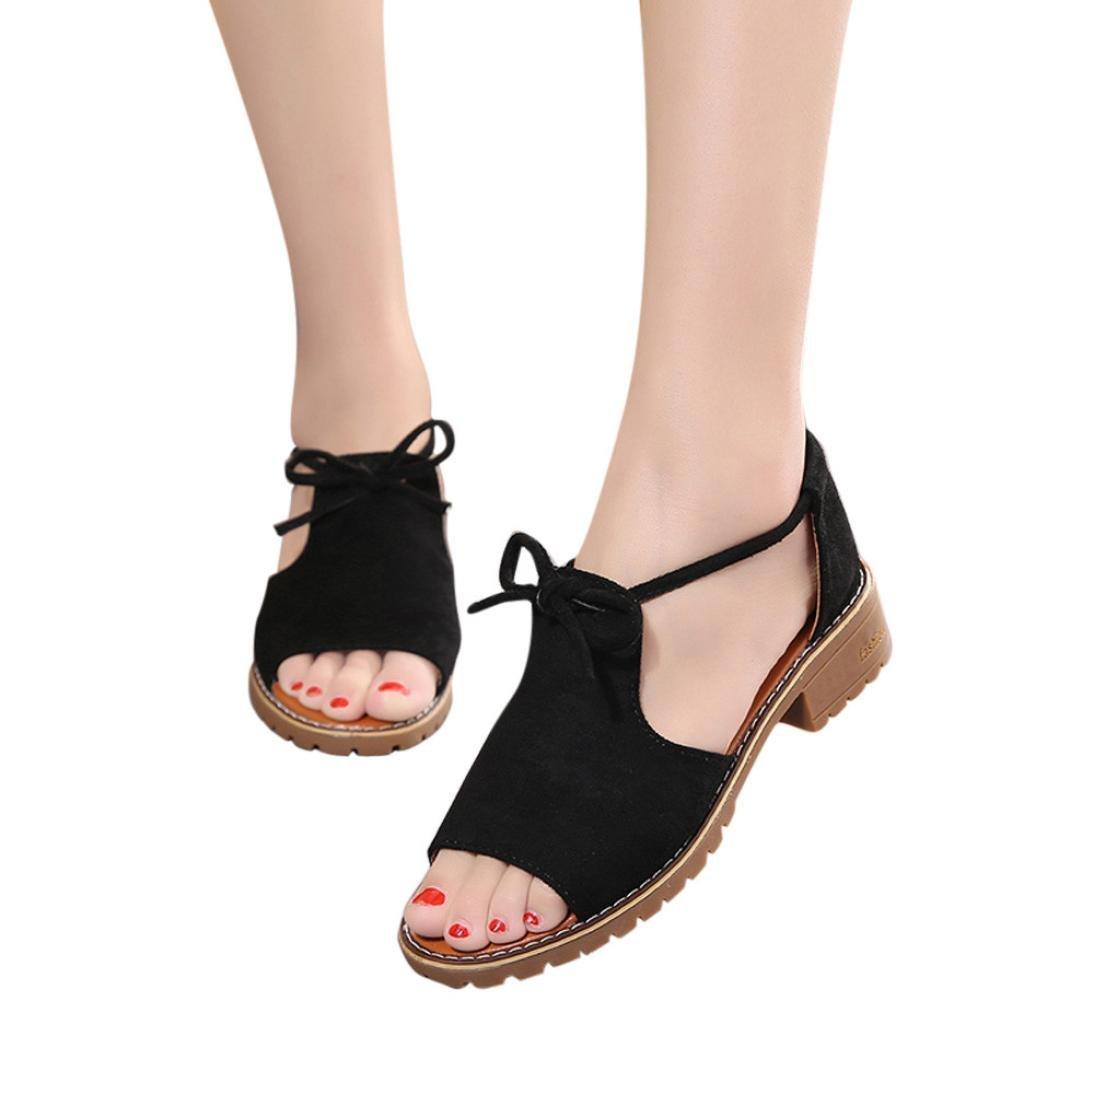 AIMTOPPY HOT Sale, Ladies Band Fish Head Open Toe Thick Heel Sandals Shoes Rome Sandals Shoes (US:7, Black)